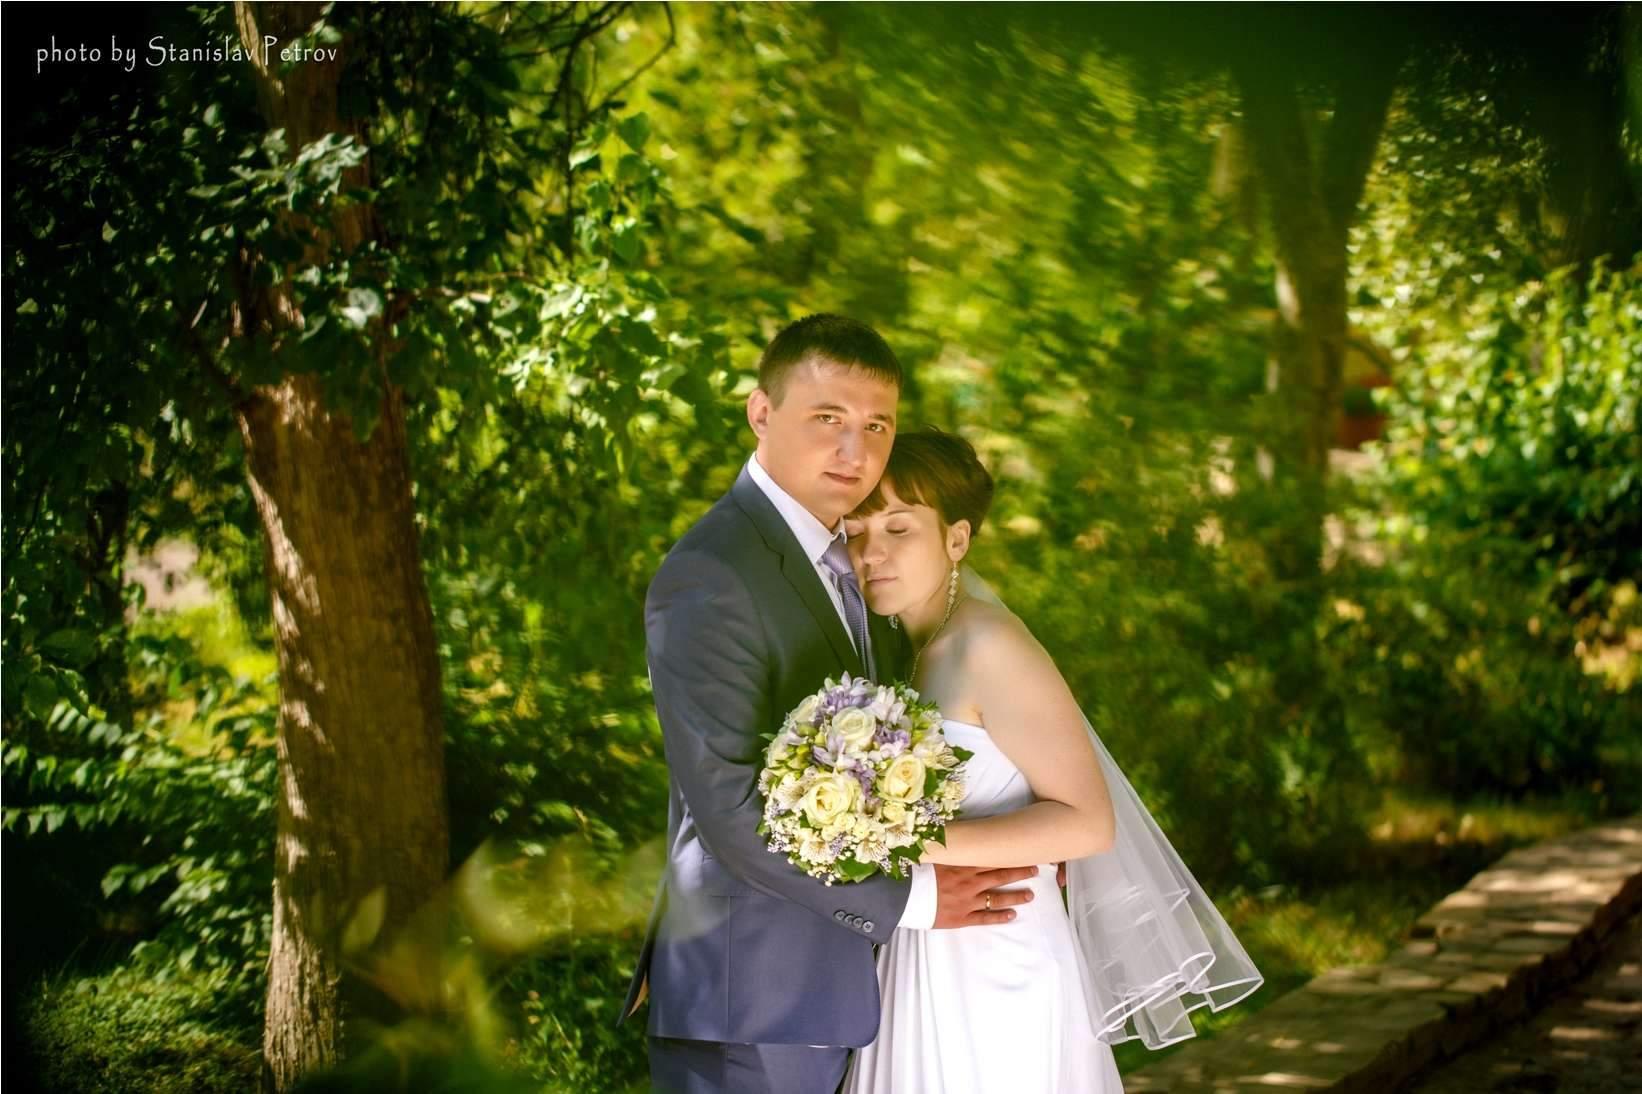 Свадьба до петрова дня